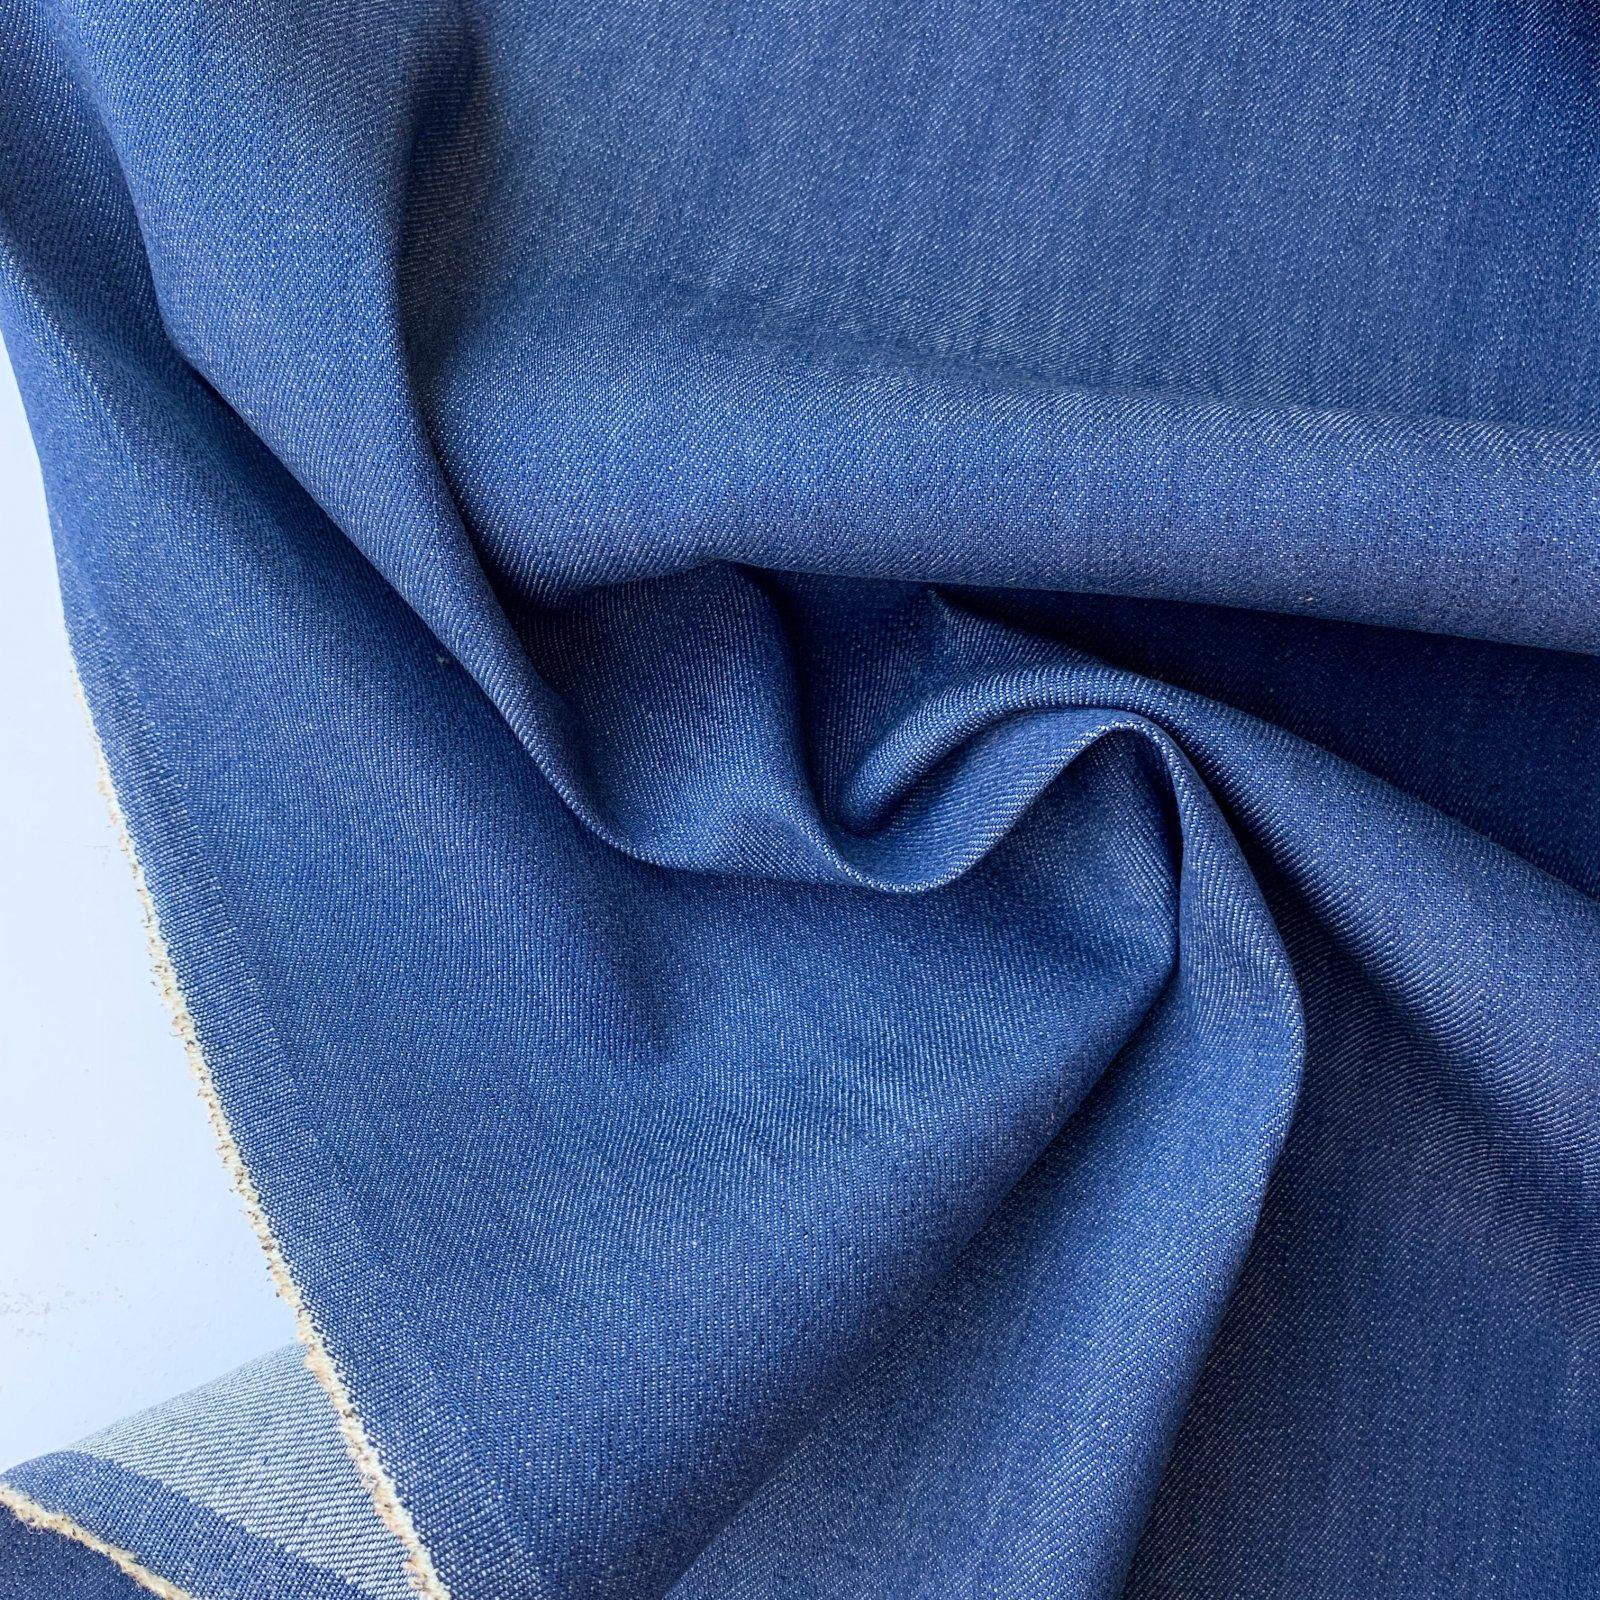 Designer Deadstock Midweight Denim - Vintage Blue 54